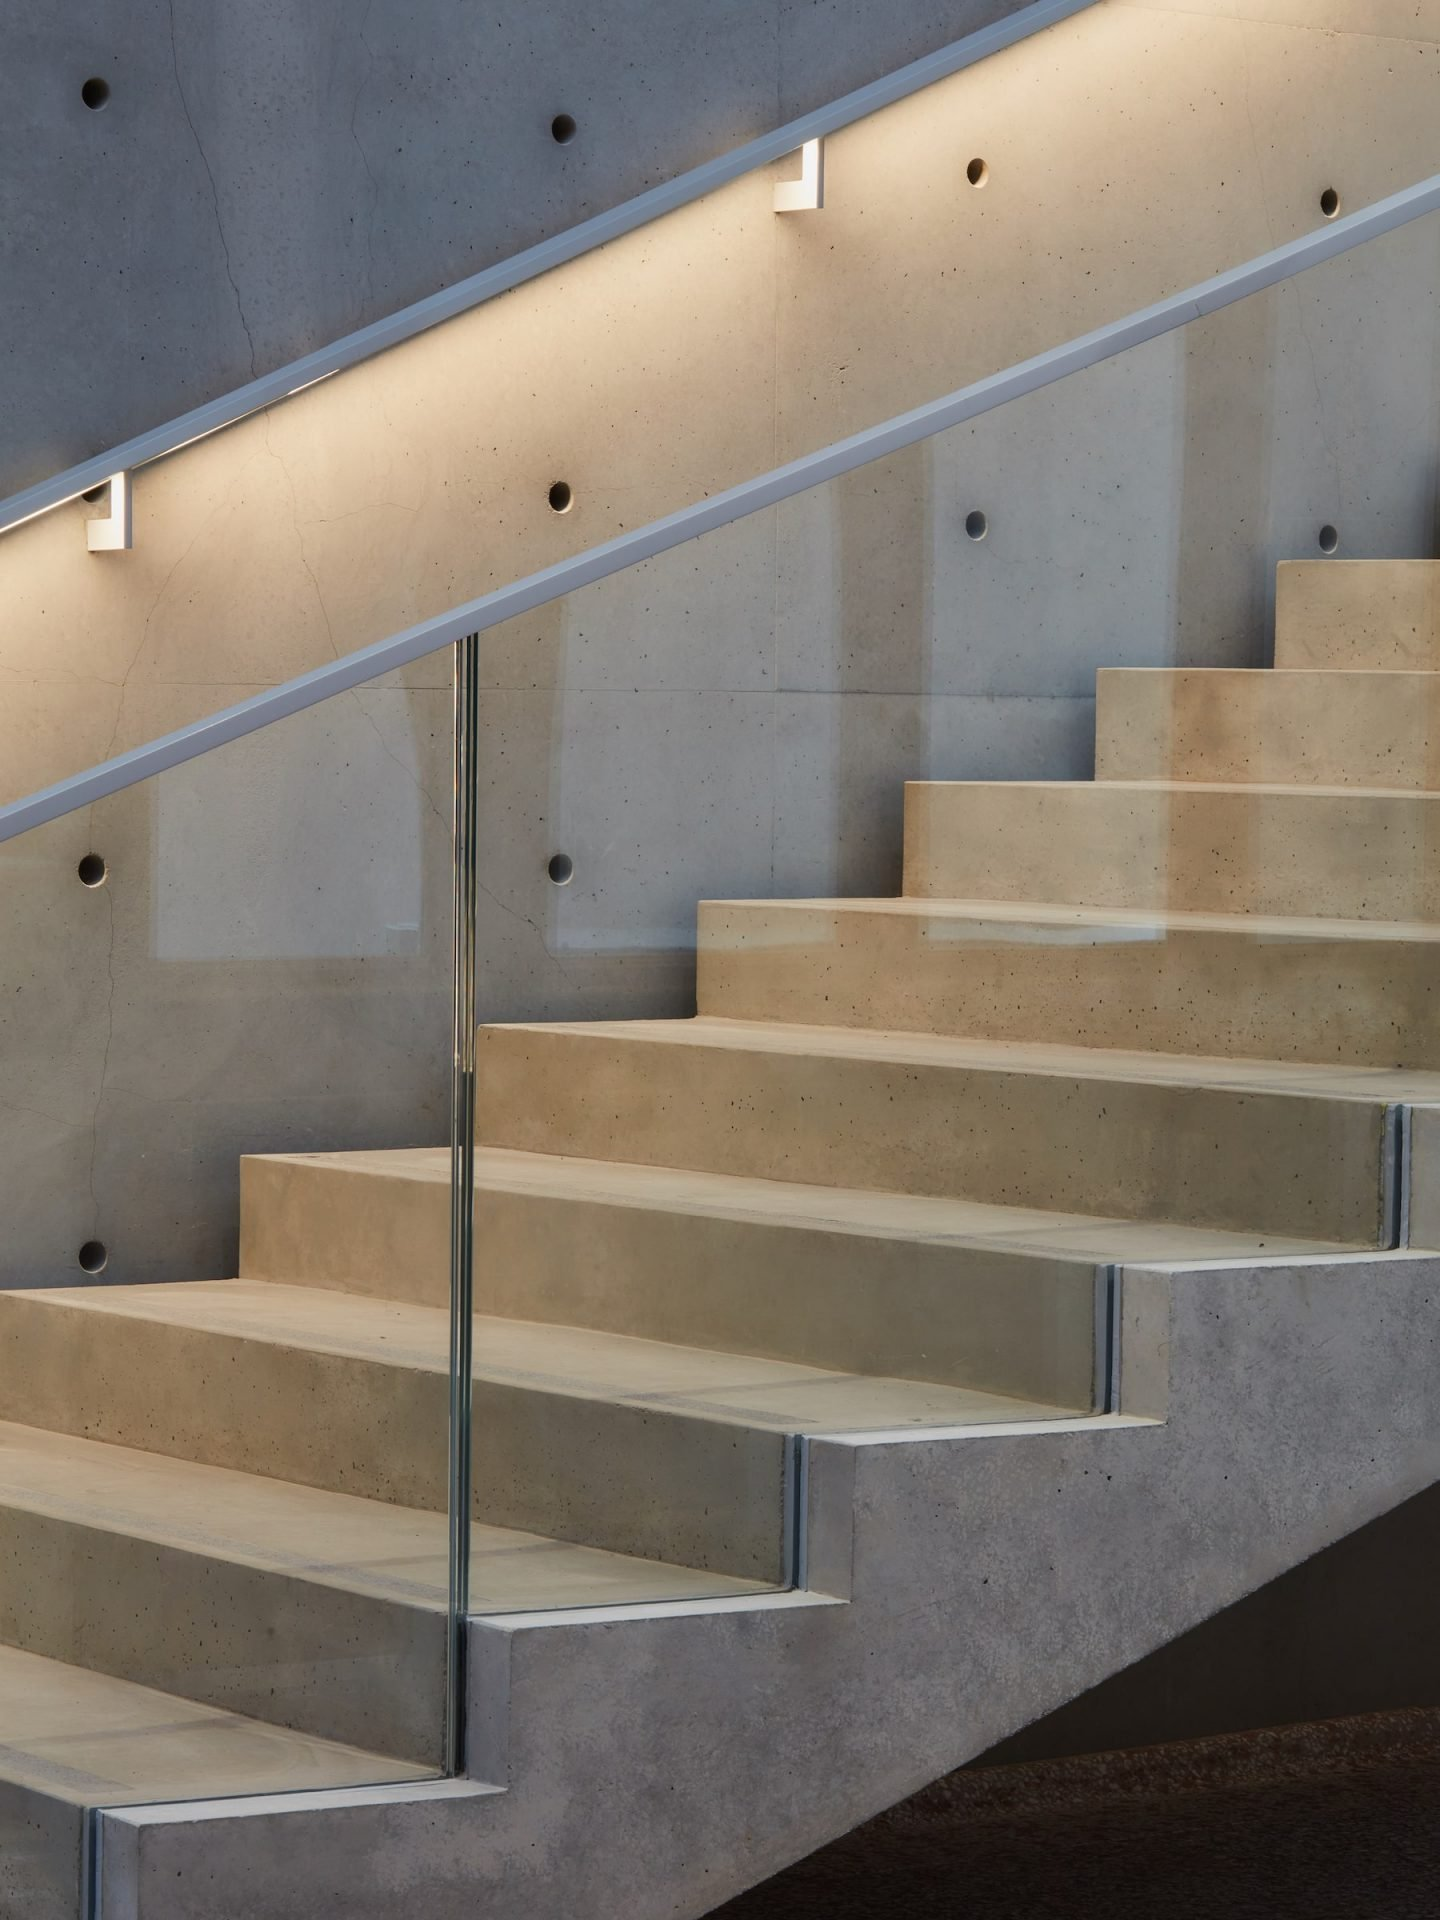 IGNANT-Architecture-Paris-Bourse-de-Commerce-Maxime-Tetard-03